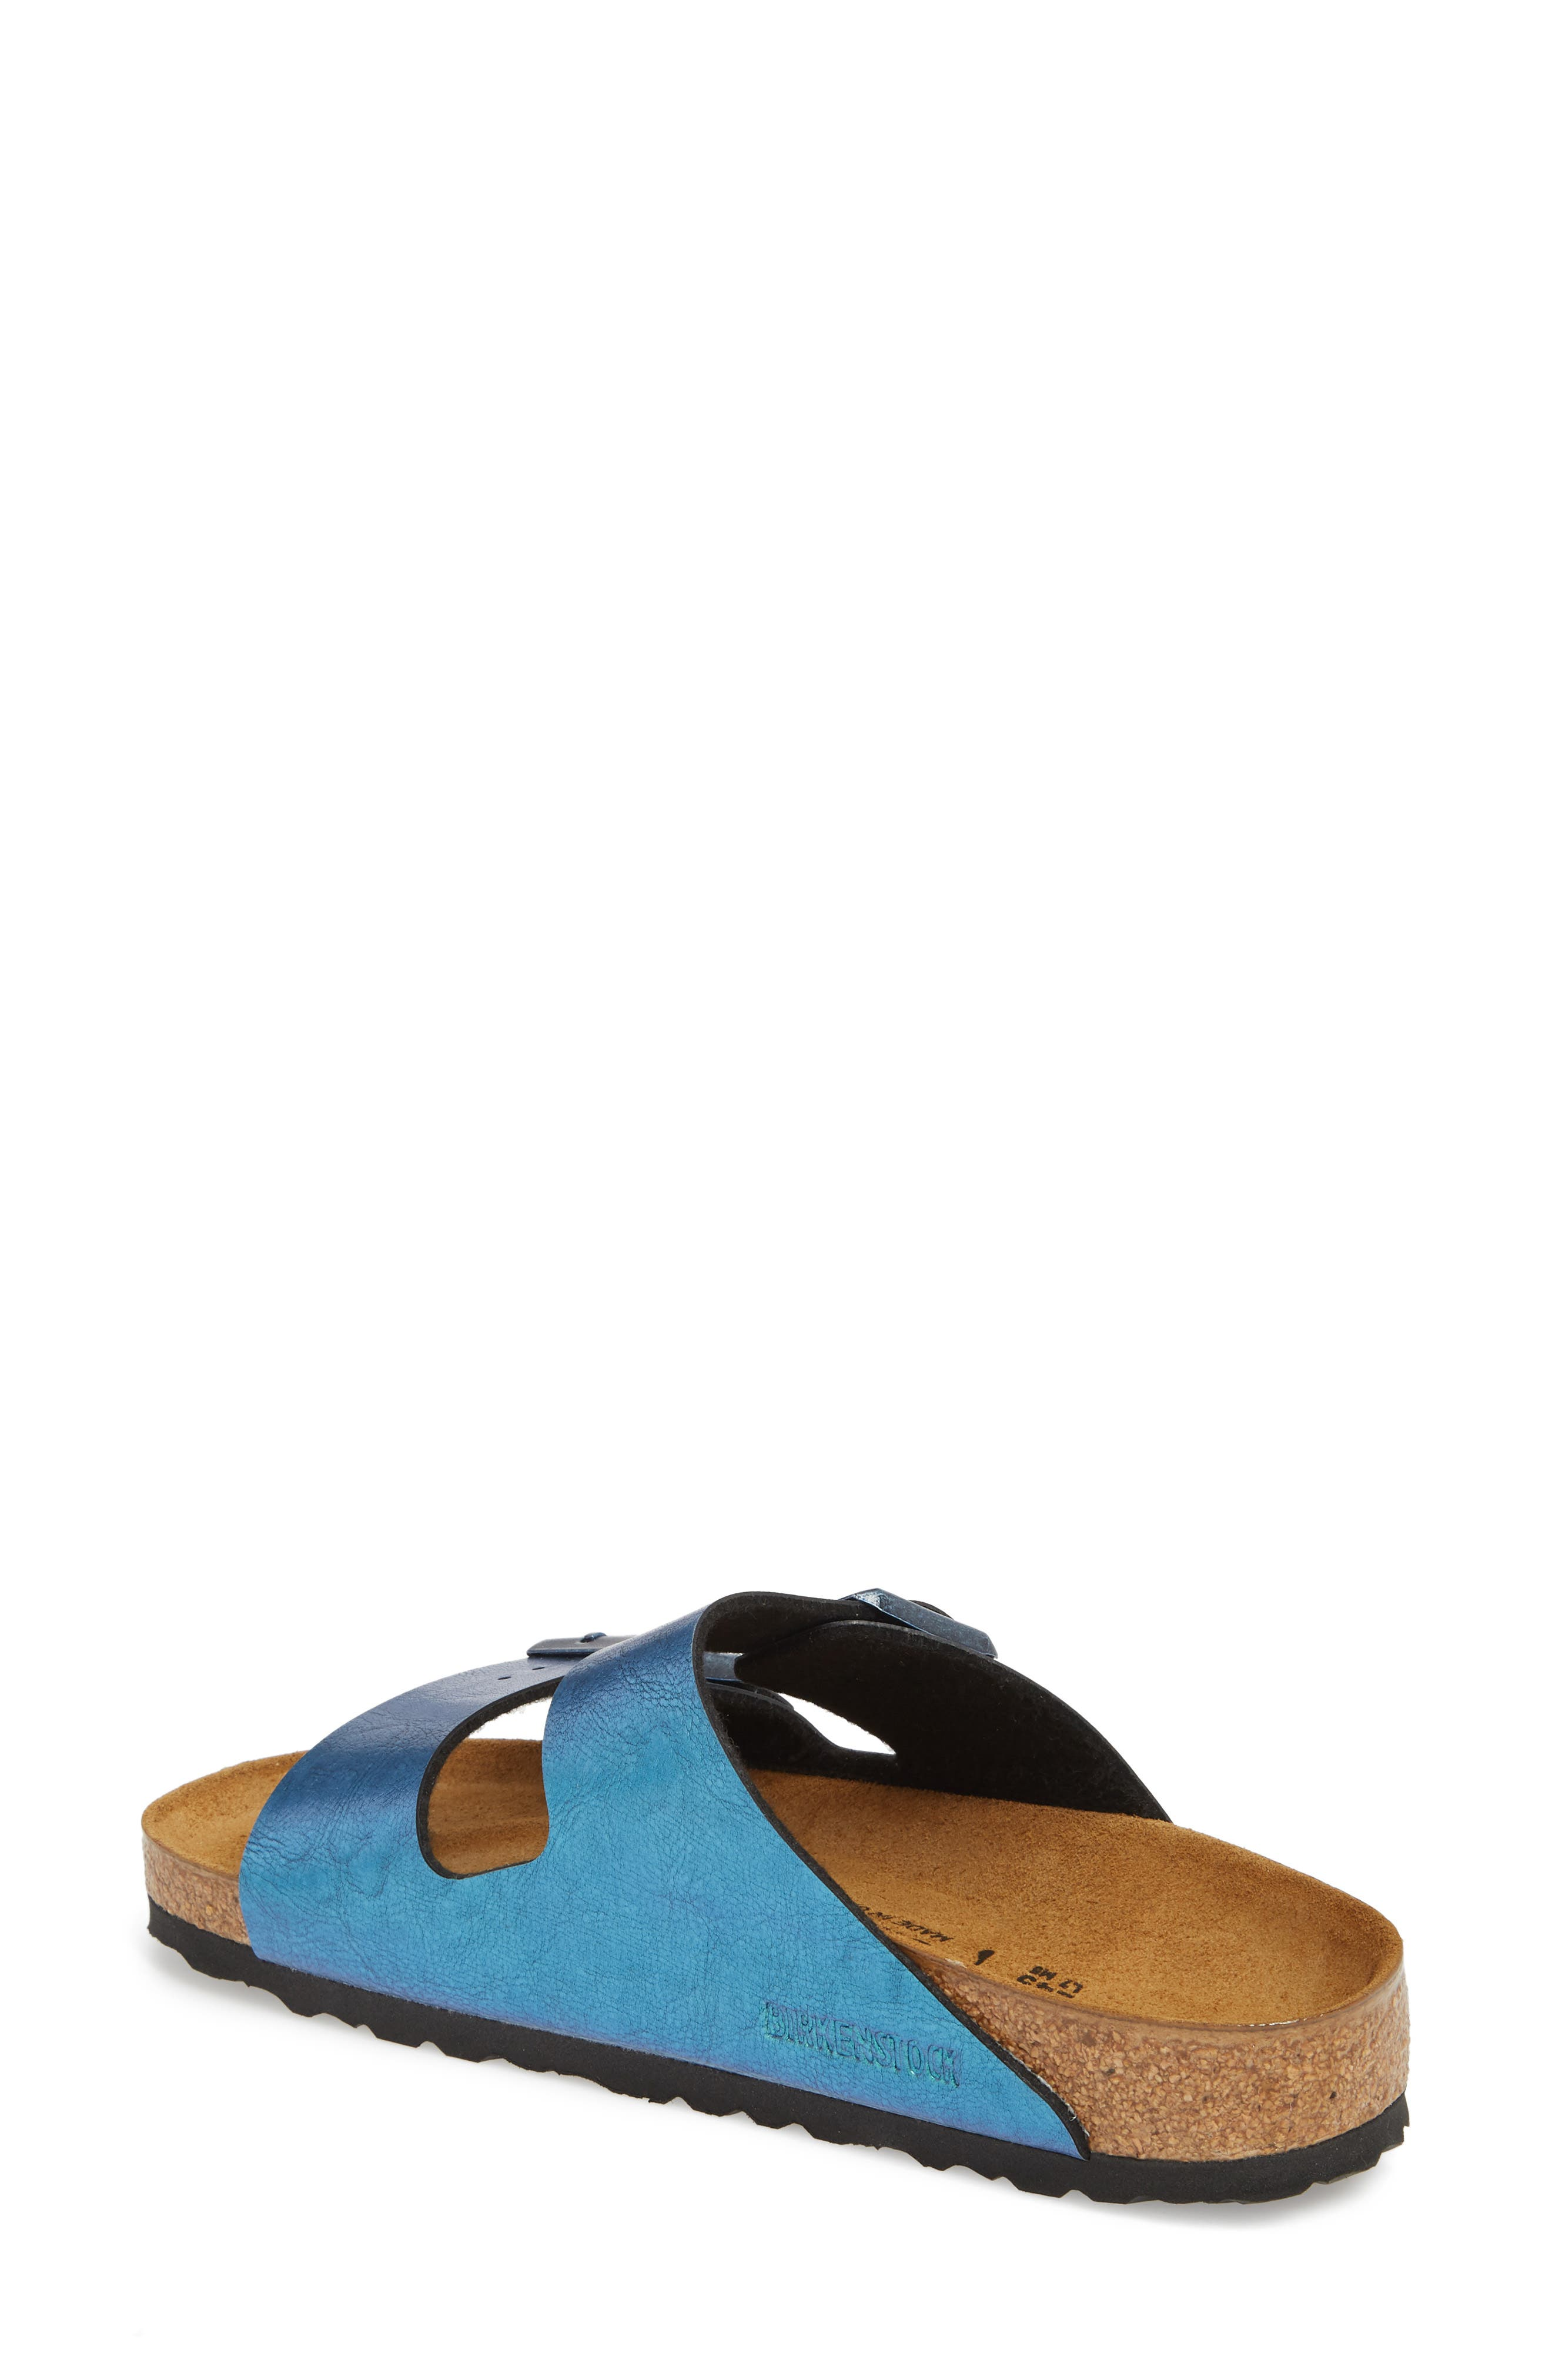 Arizona Graceful Birko-Flor<sup>™</sup> Sandal,                             Alternate thumbnail 2, color,                             400